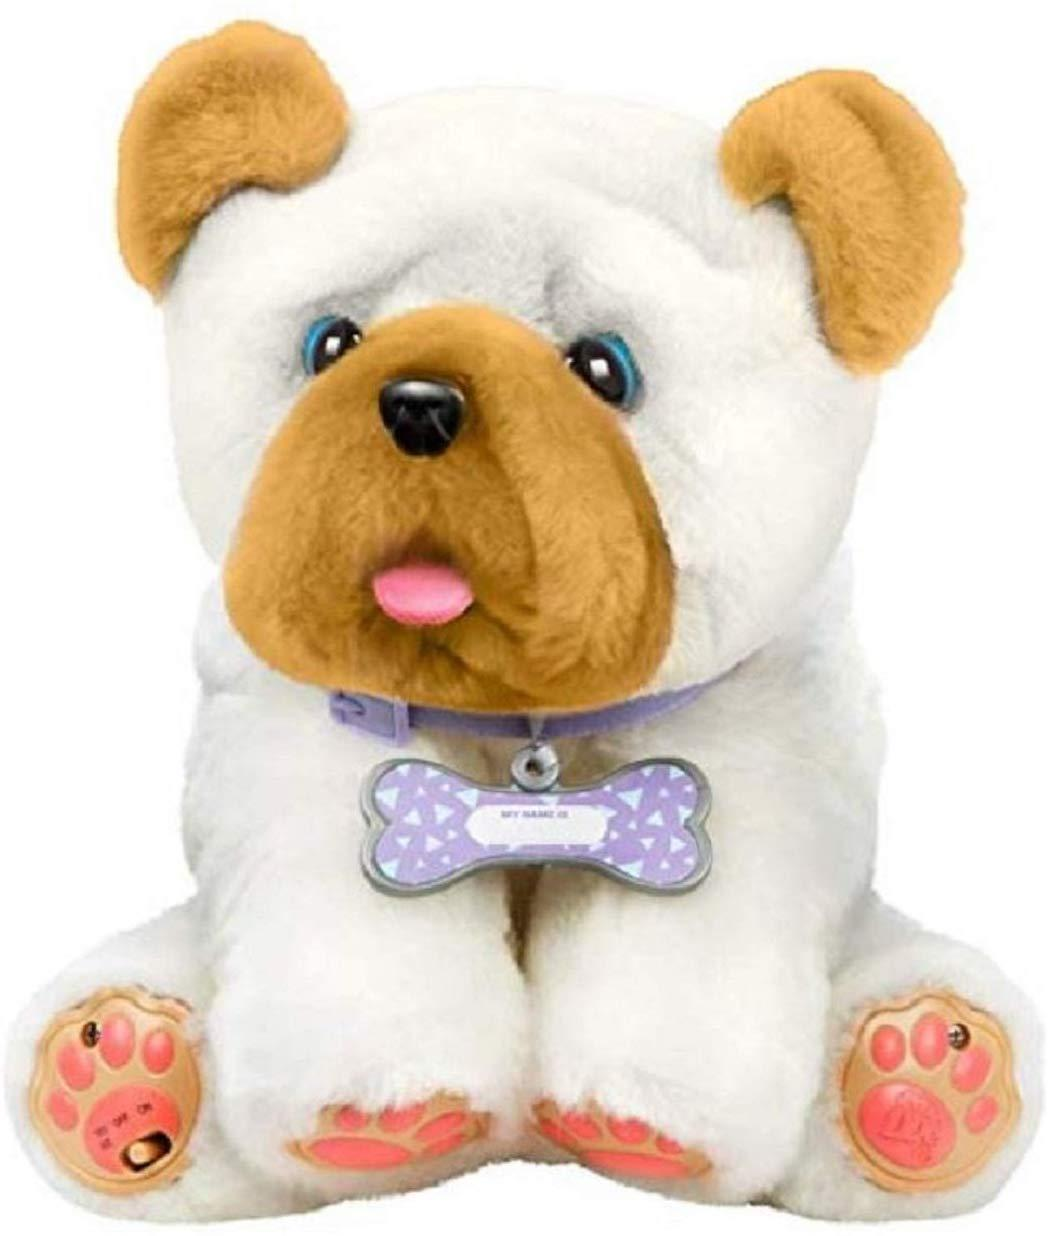 Интерактивный щенок, My Kissing Puppy Wrinkles, Little Live Pets Оригинал из США